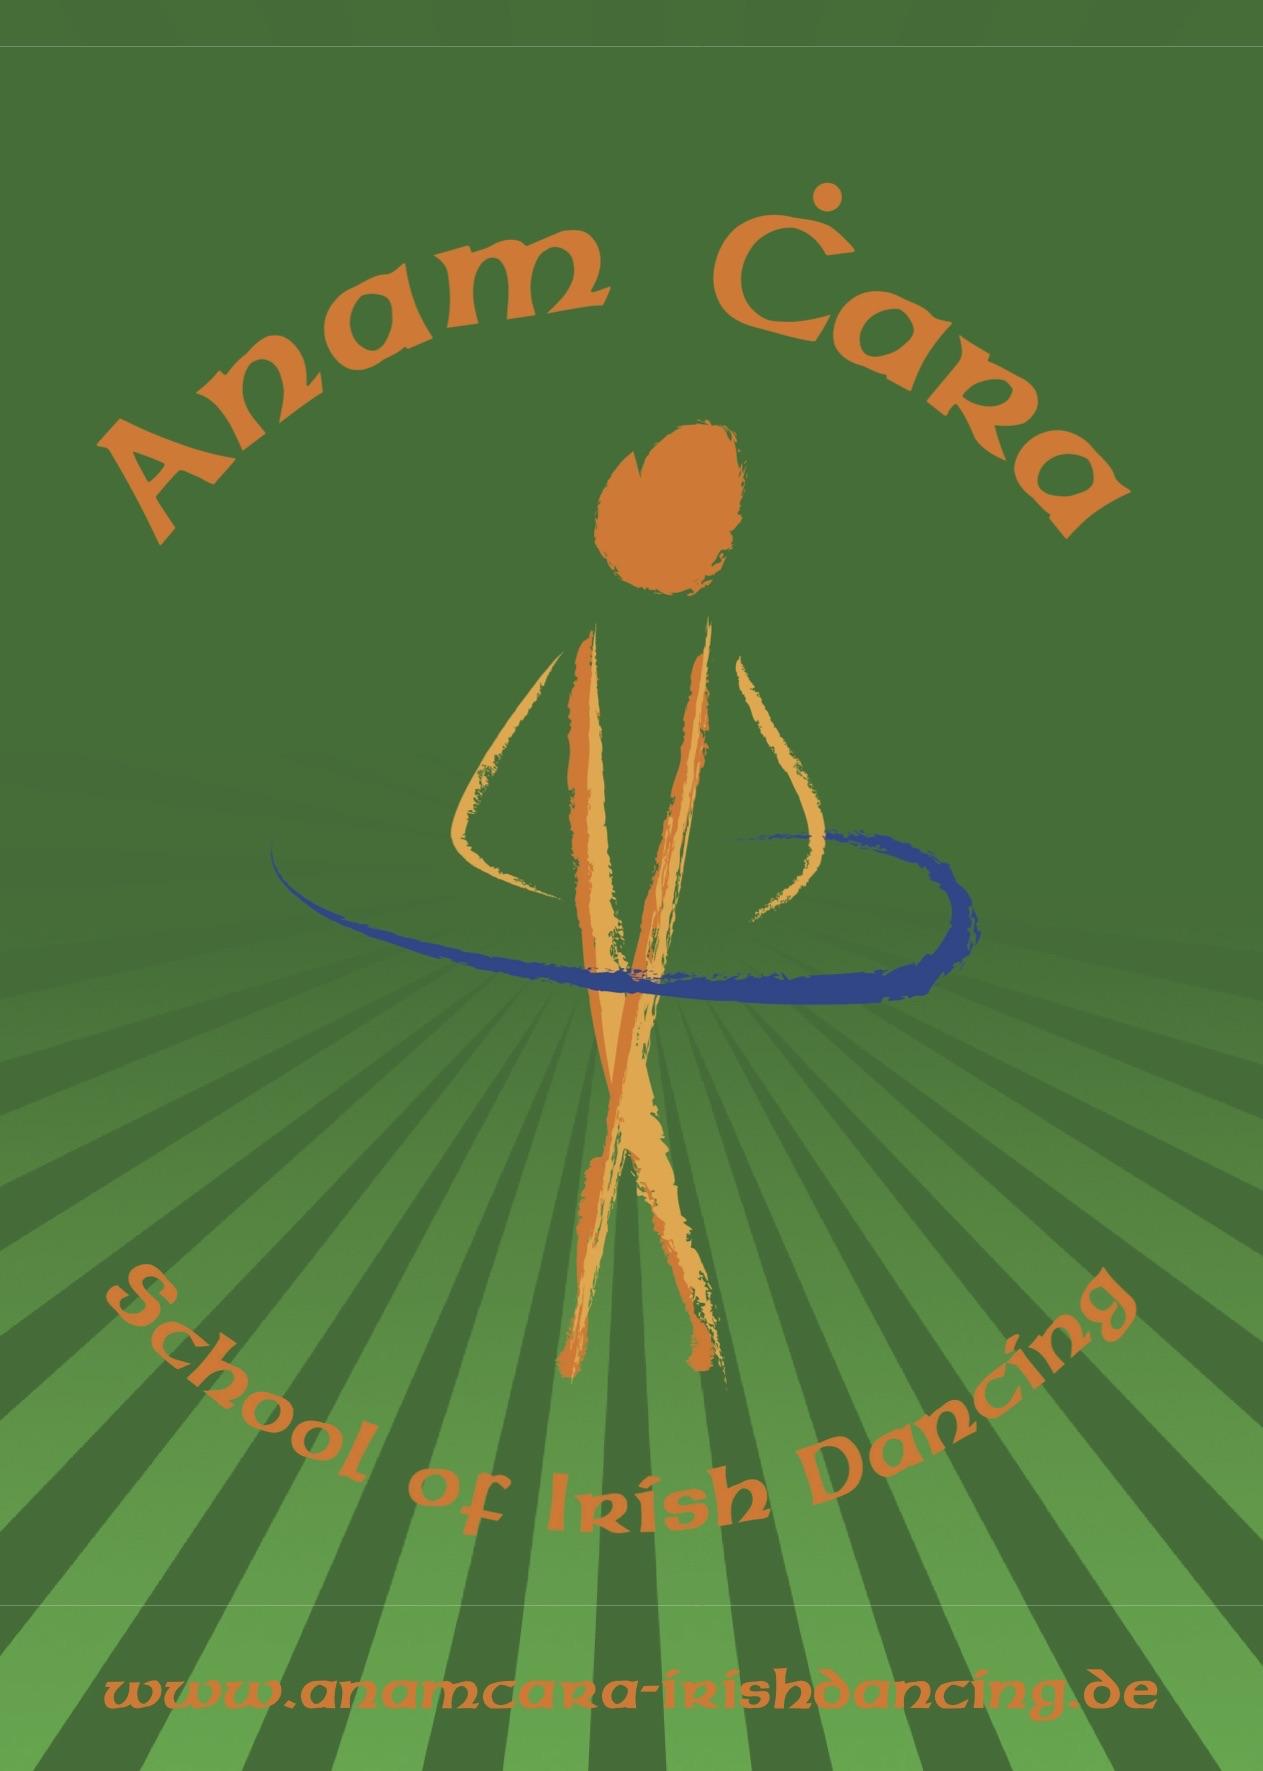 Anam Cara School of Irish Dancing